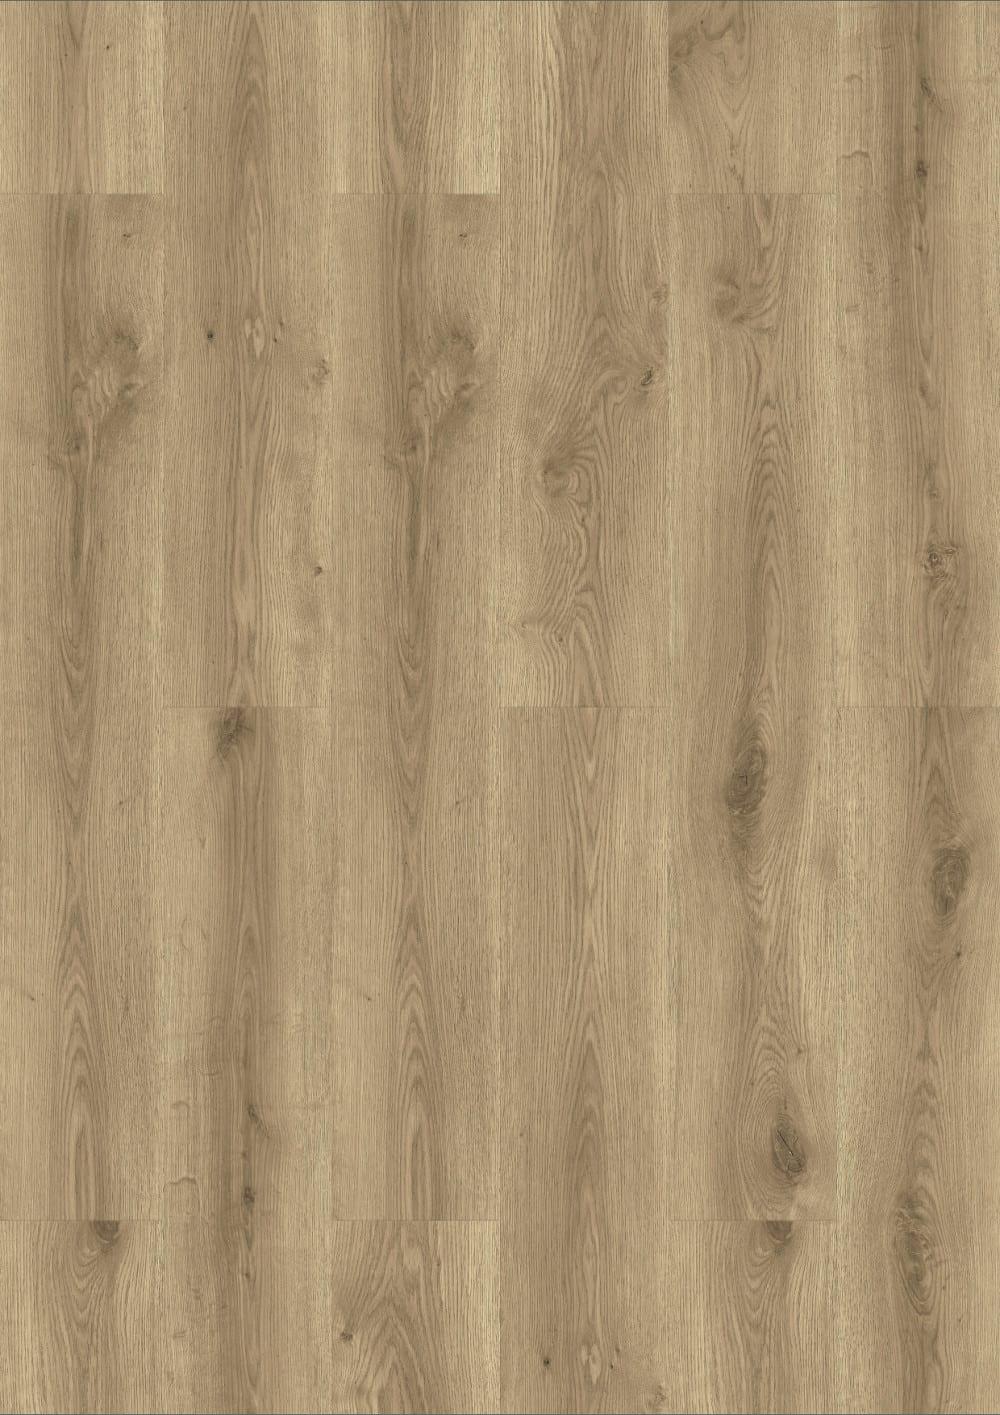 easium tarkett vinyl laminat klick hdf vinylboden raumtrend hinze. Black Bedroom Furniture Sets. Home Design Ideas